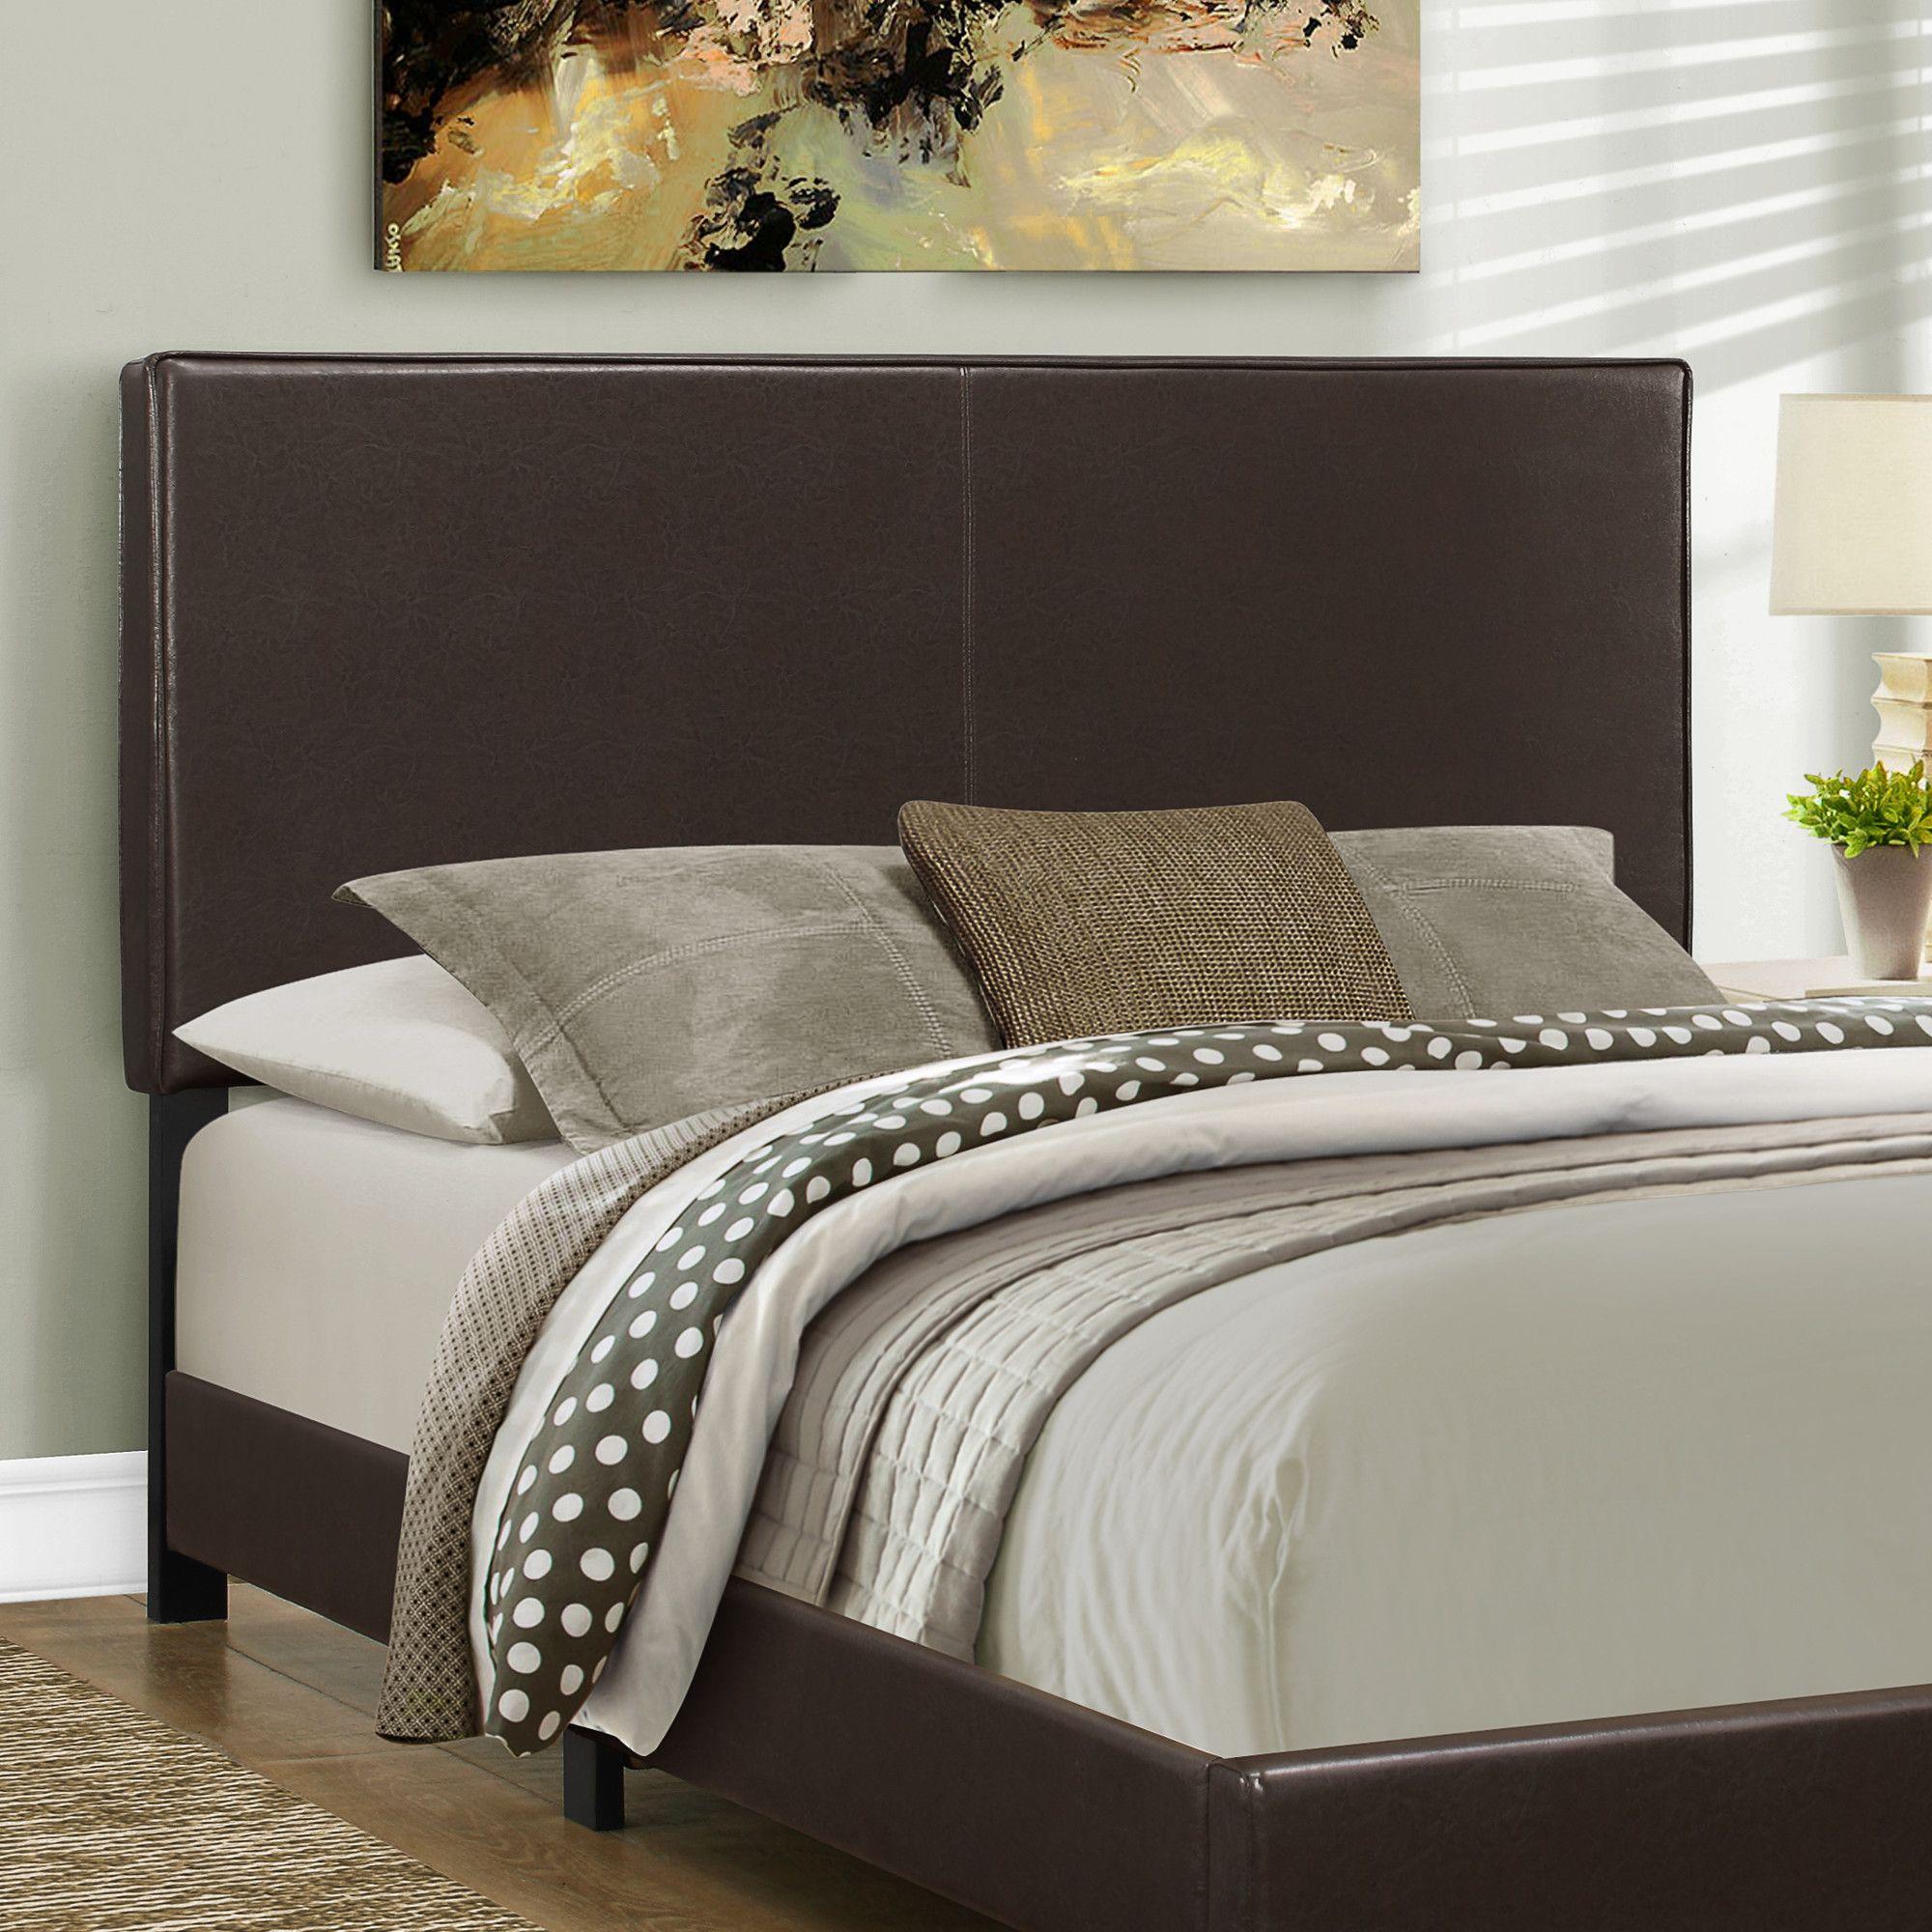 Queen Upholstered Panel Headboard Upholstered beds